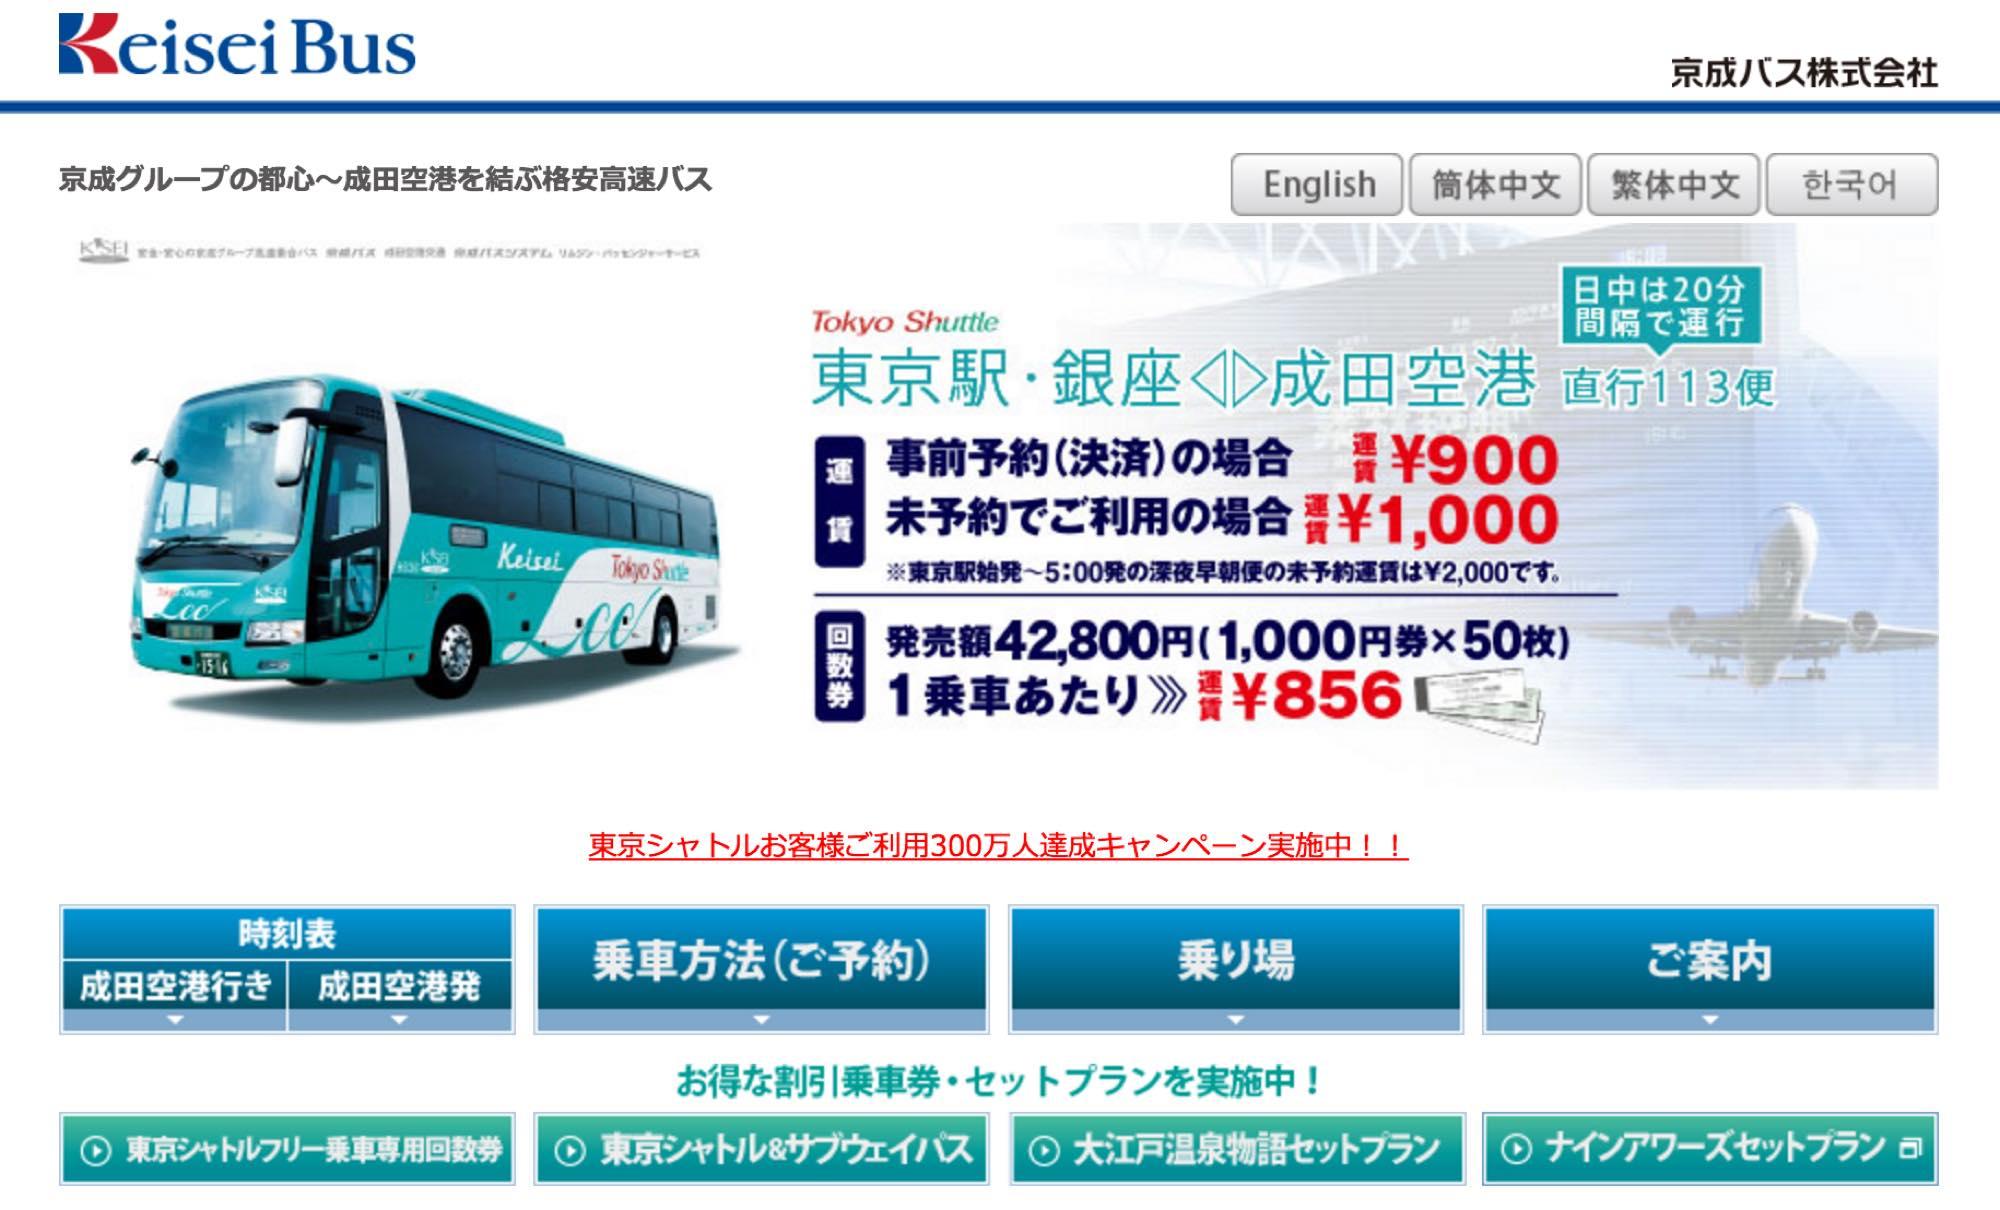 keisei-bus-narita7